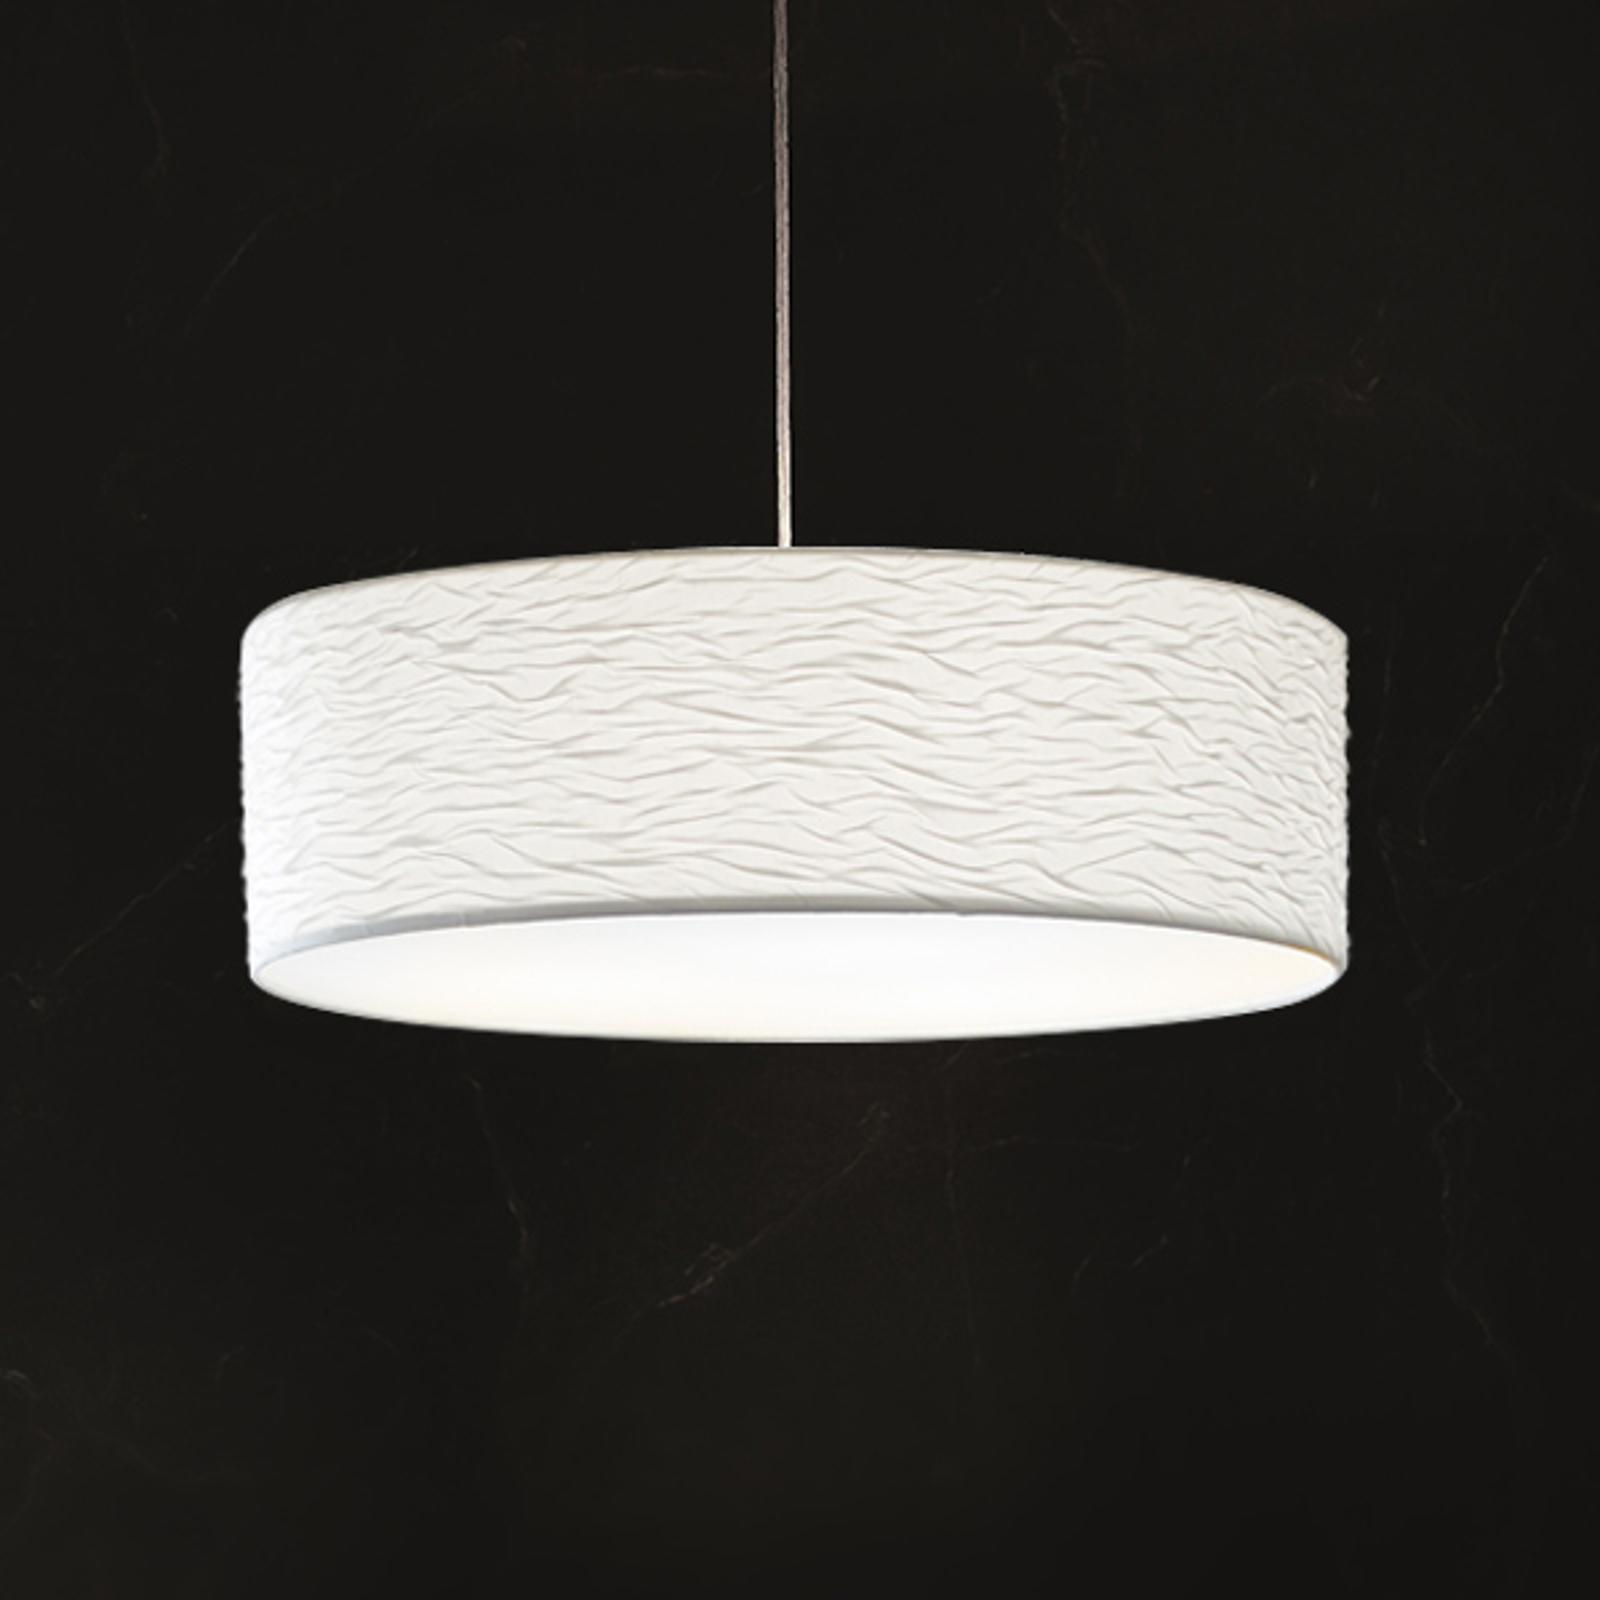 Lampa wisząca Vita P z falami, nowoczesna biel